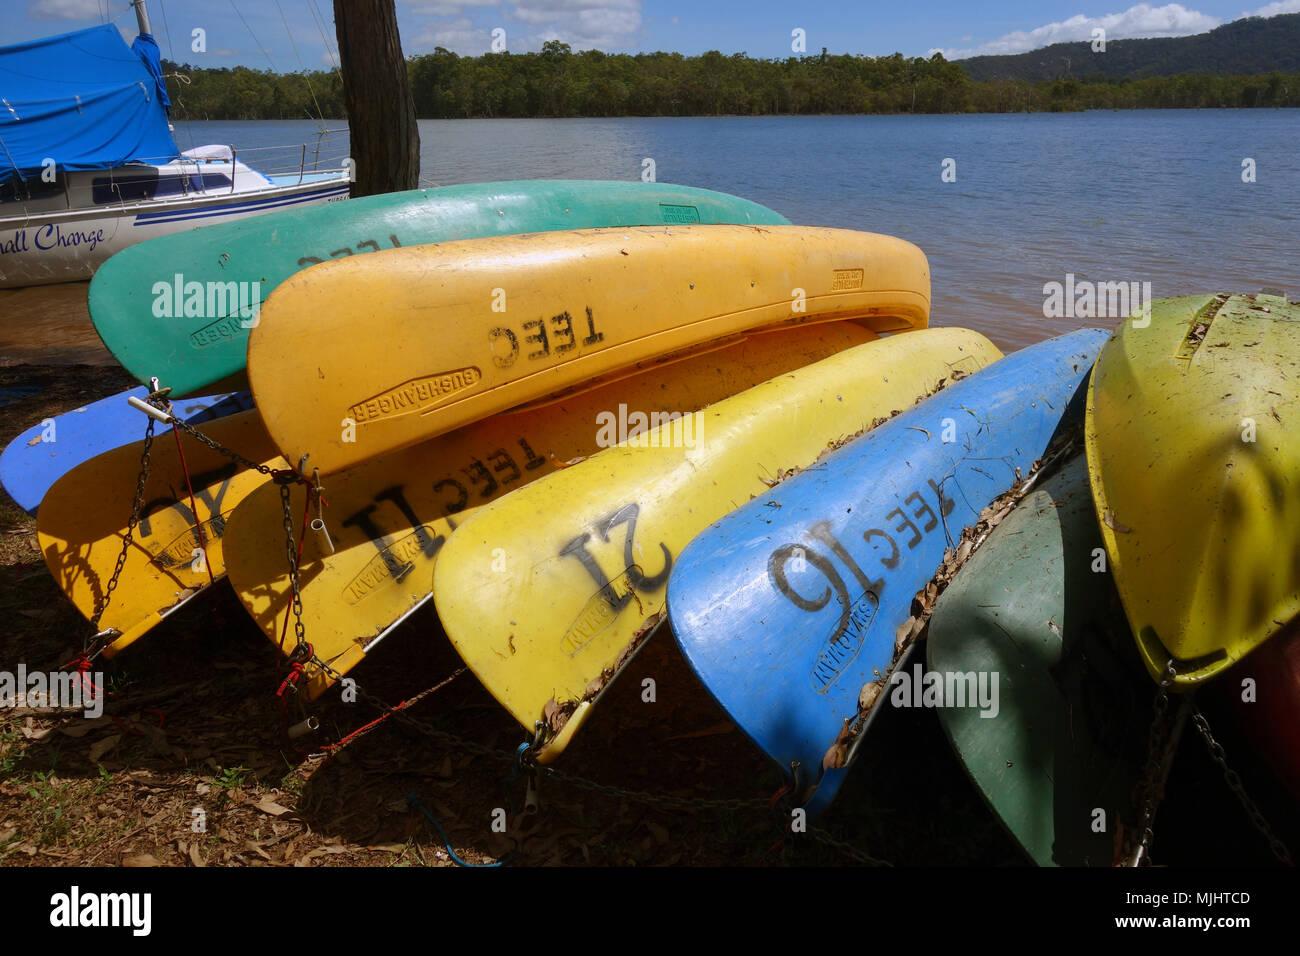 Canoes belonging to Tinaroo Environmental Education Centre on the shores of Lake Tinaroo, Atherton Tablelands, Queensland, Australia. No PR - Stock Image